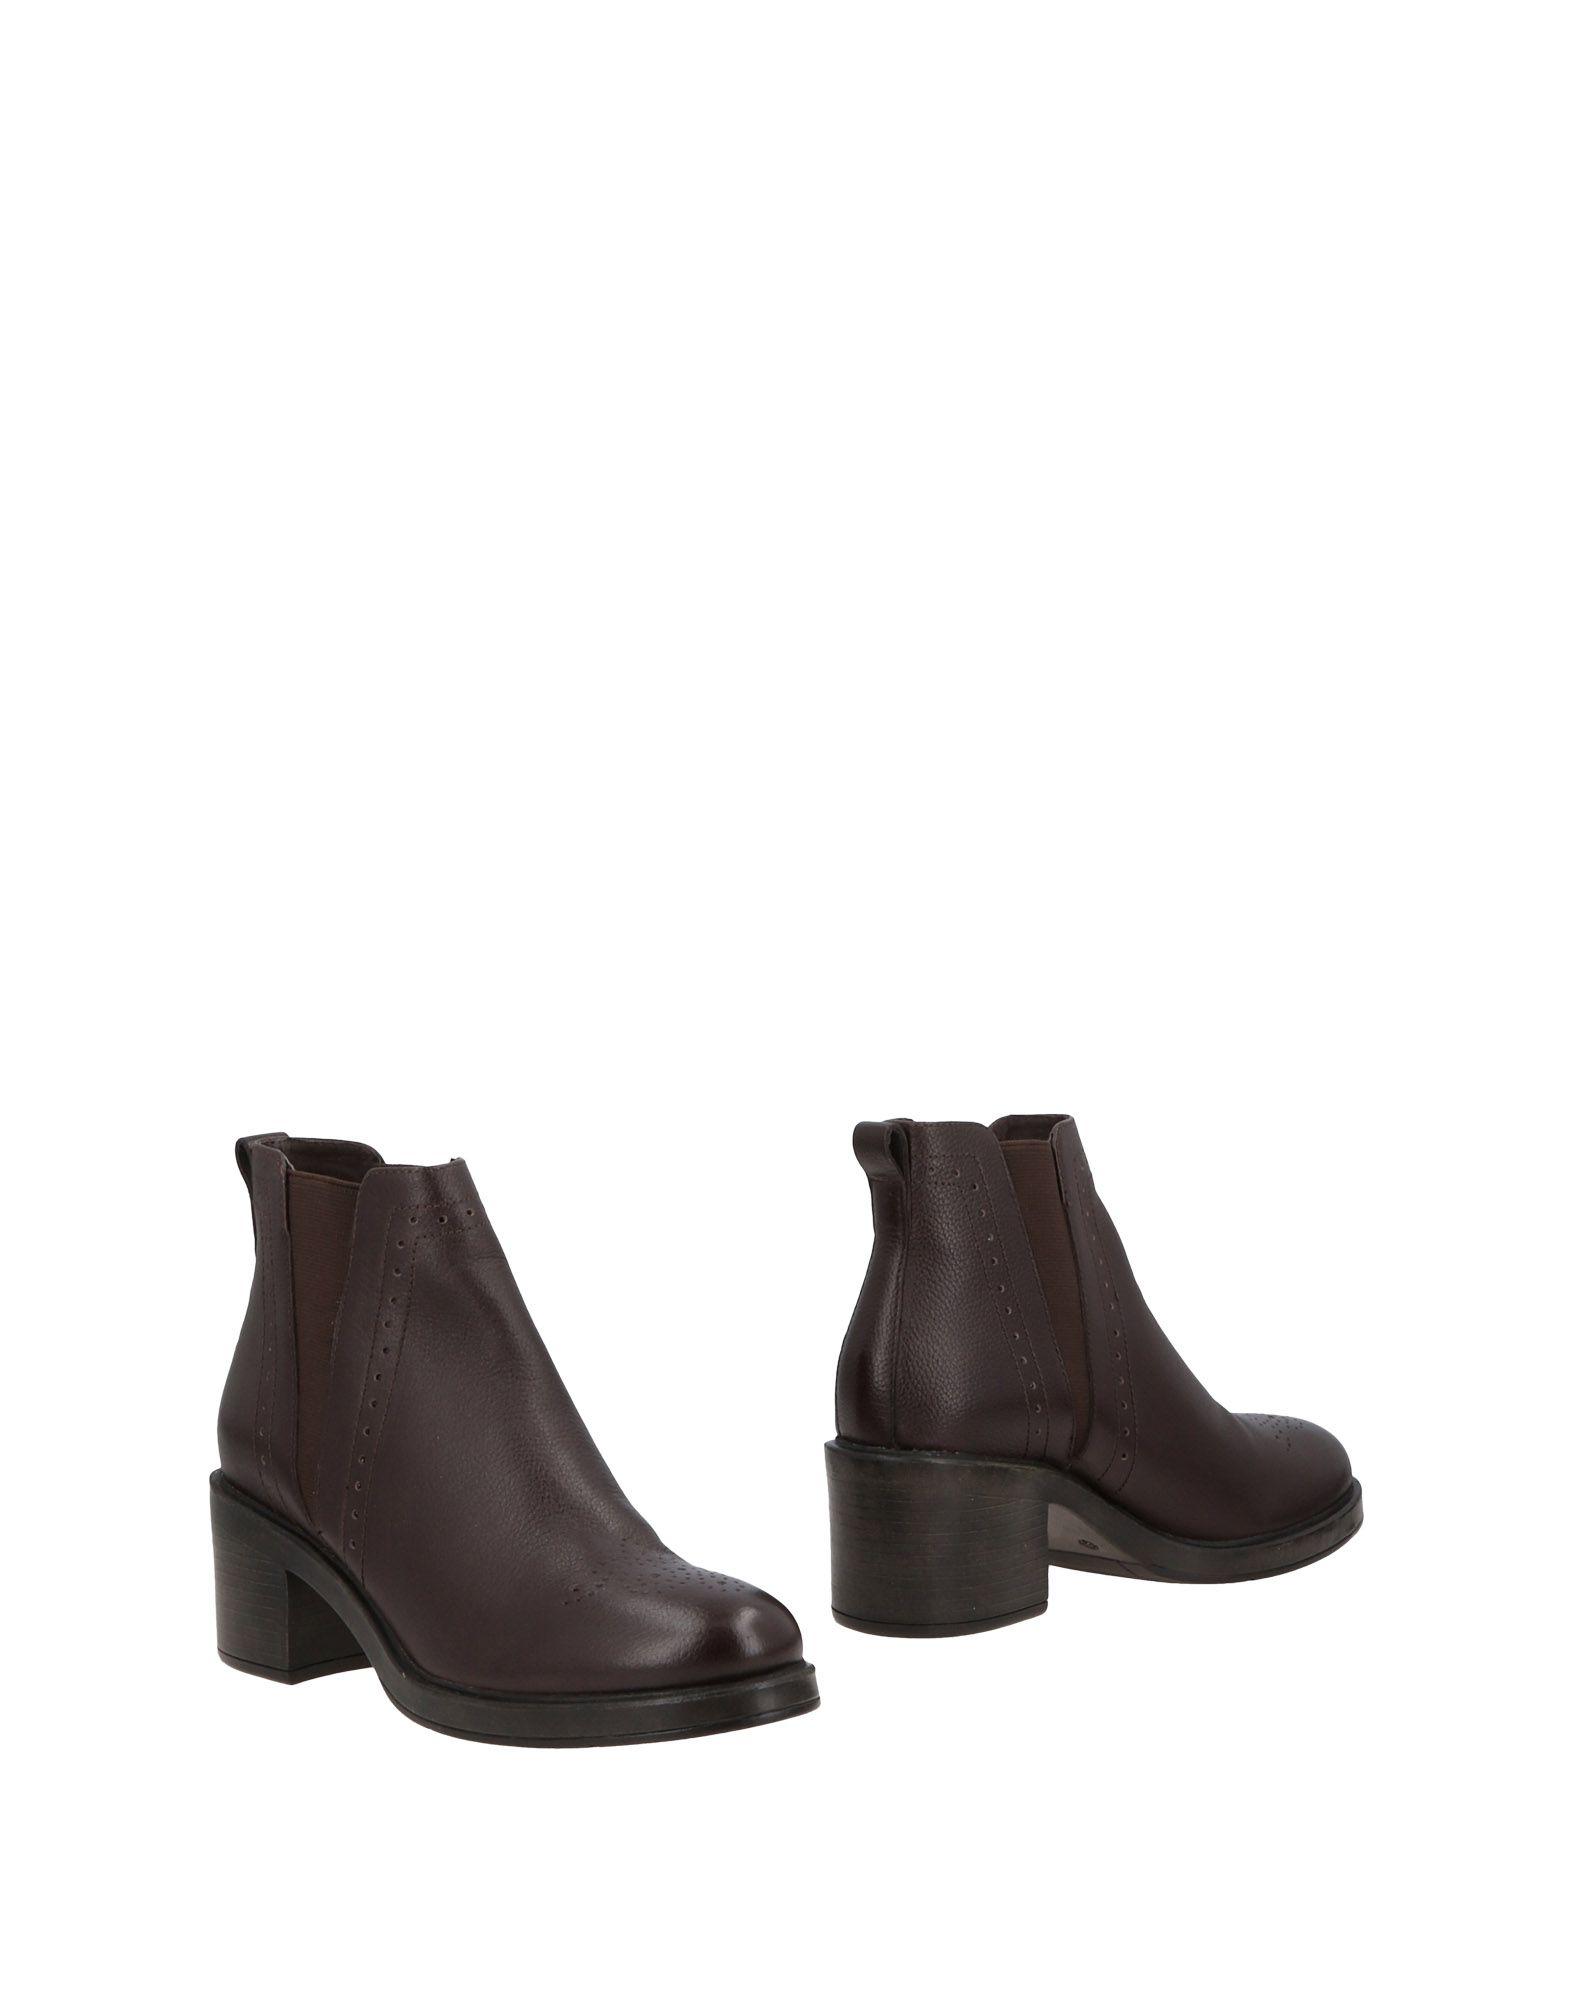 Cuoieria Chelsea Boots Damen  11484668KH Gute Qualität beliebte Schuhe